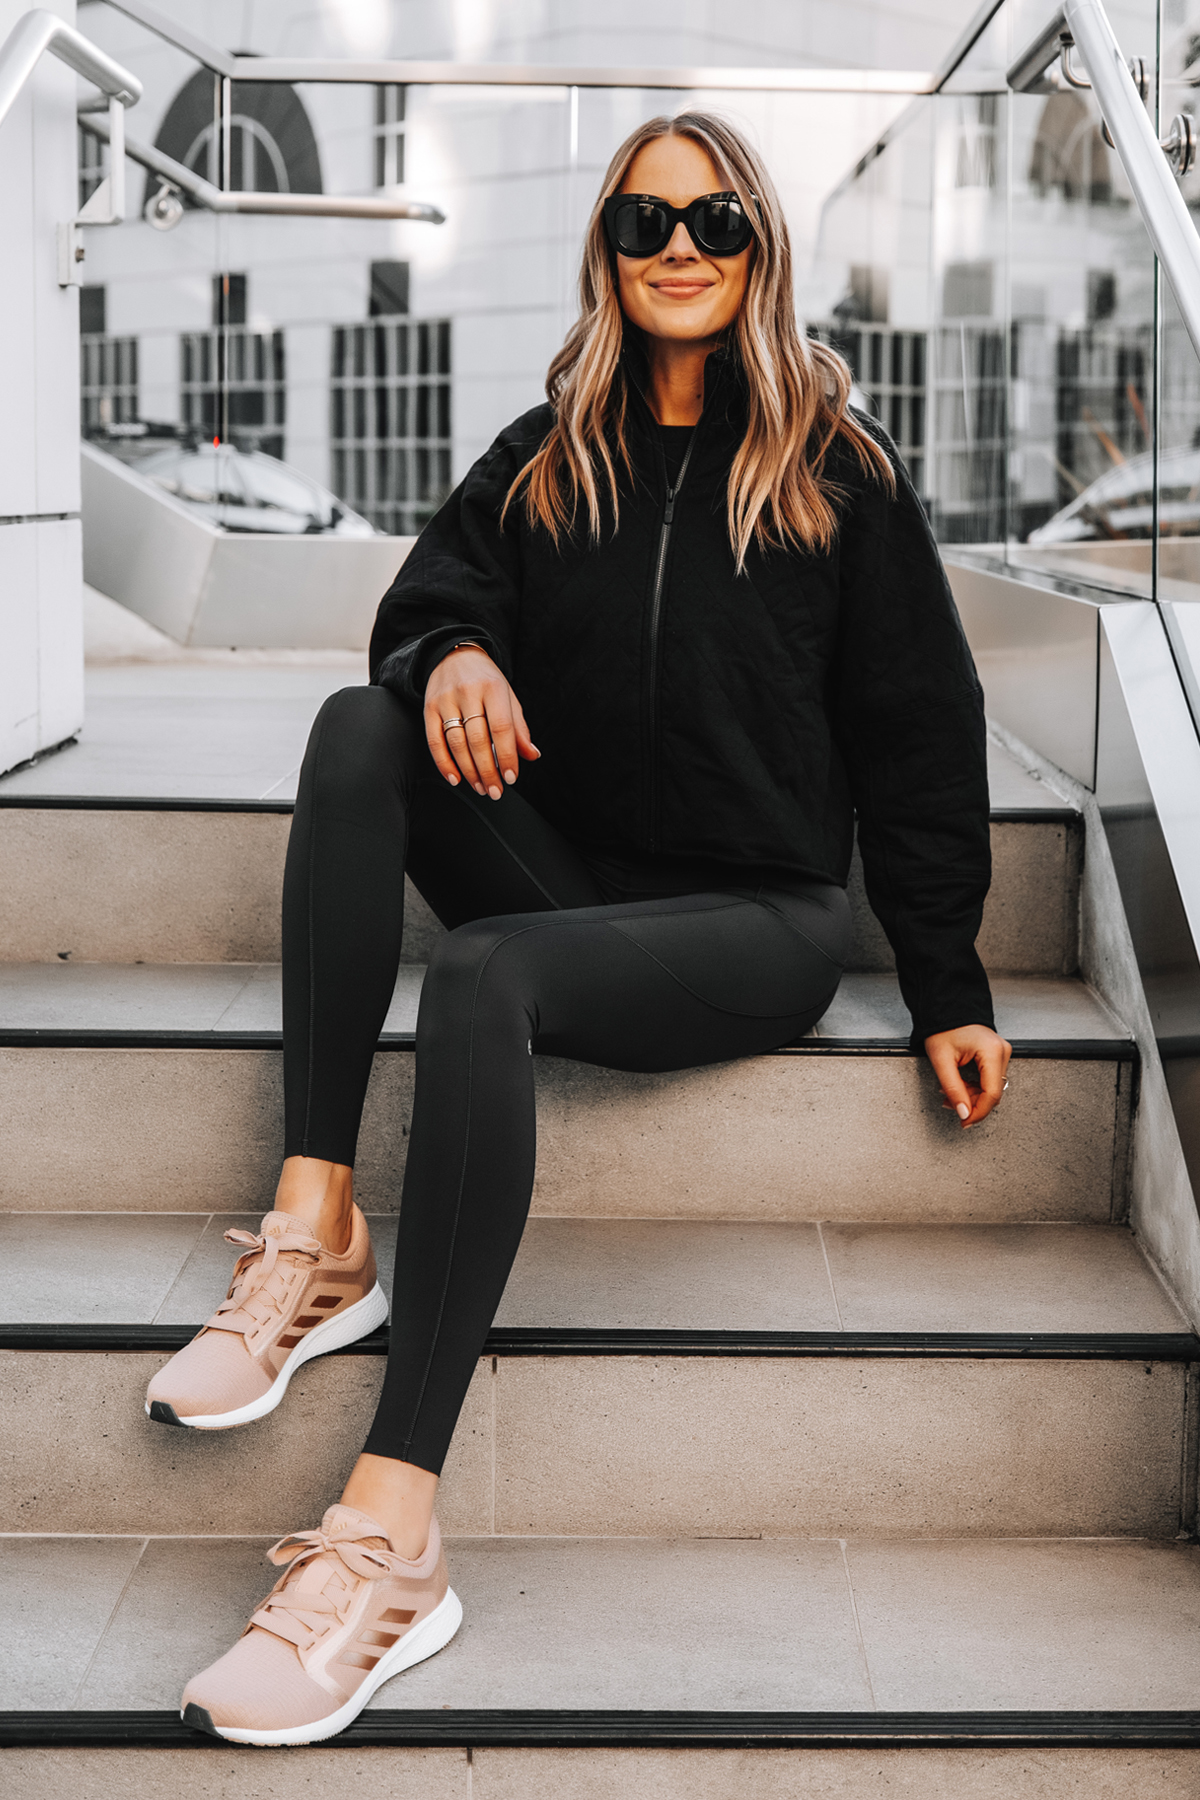 Fashion Jackson Wearing lululemon Black Outfit adidas Pink Sneakers 1